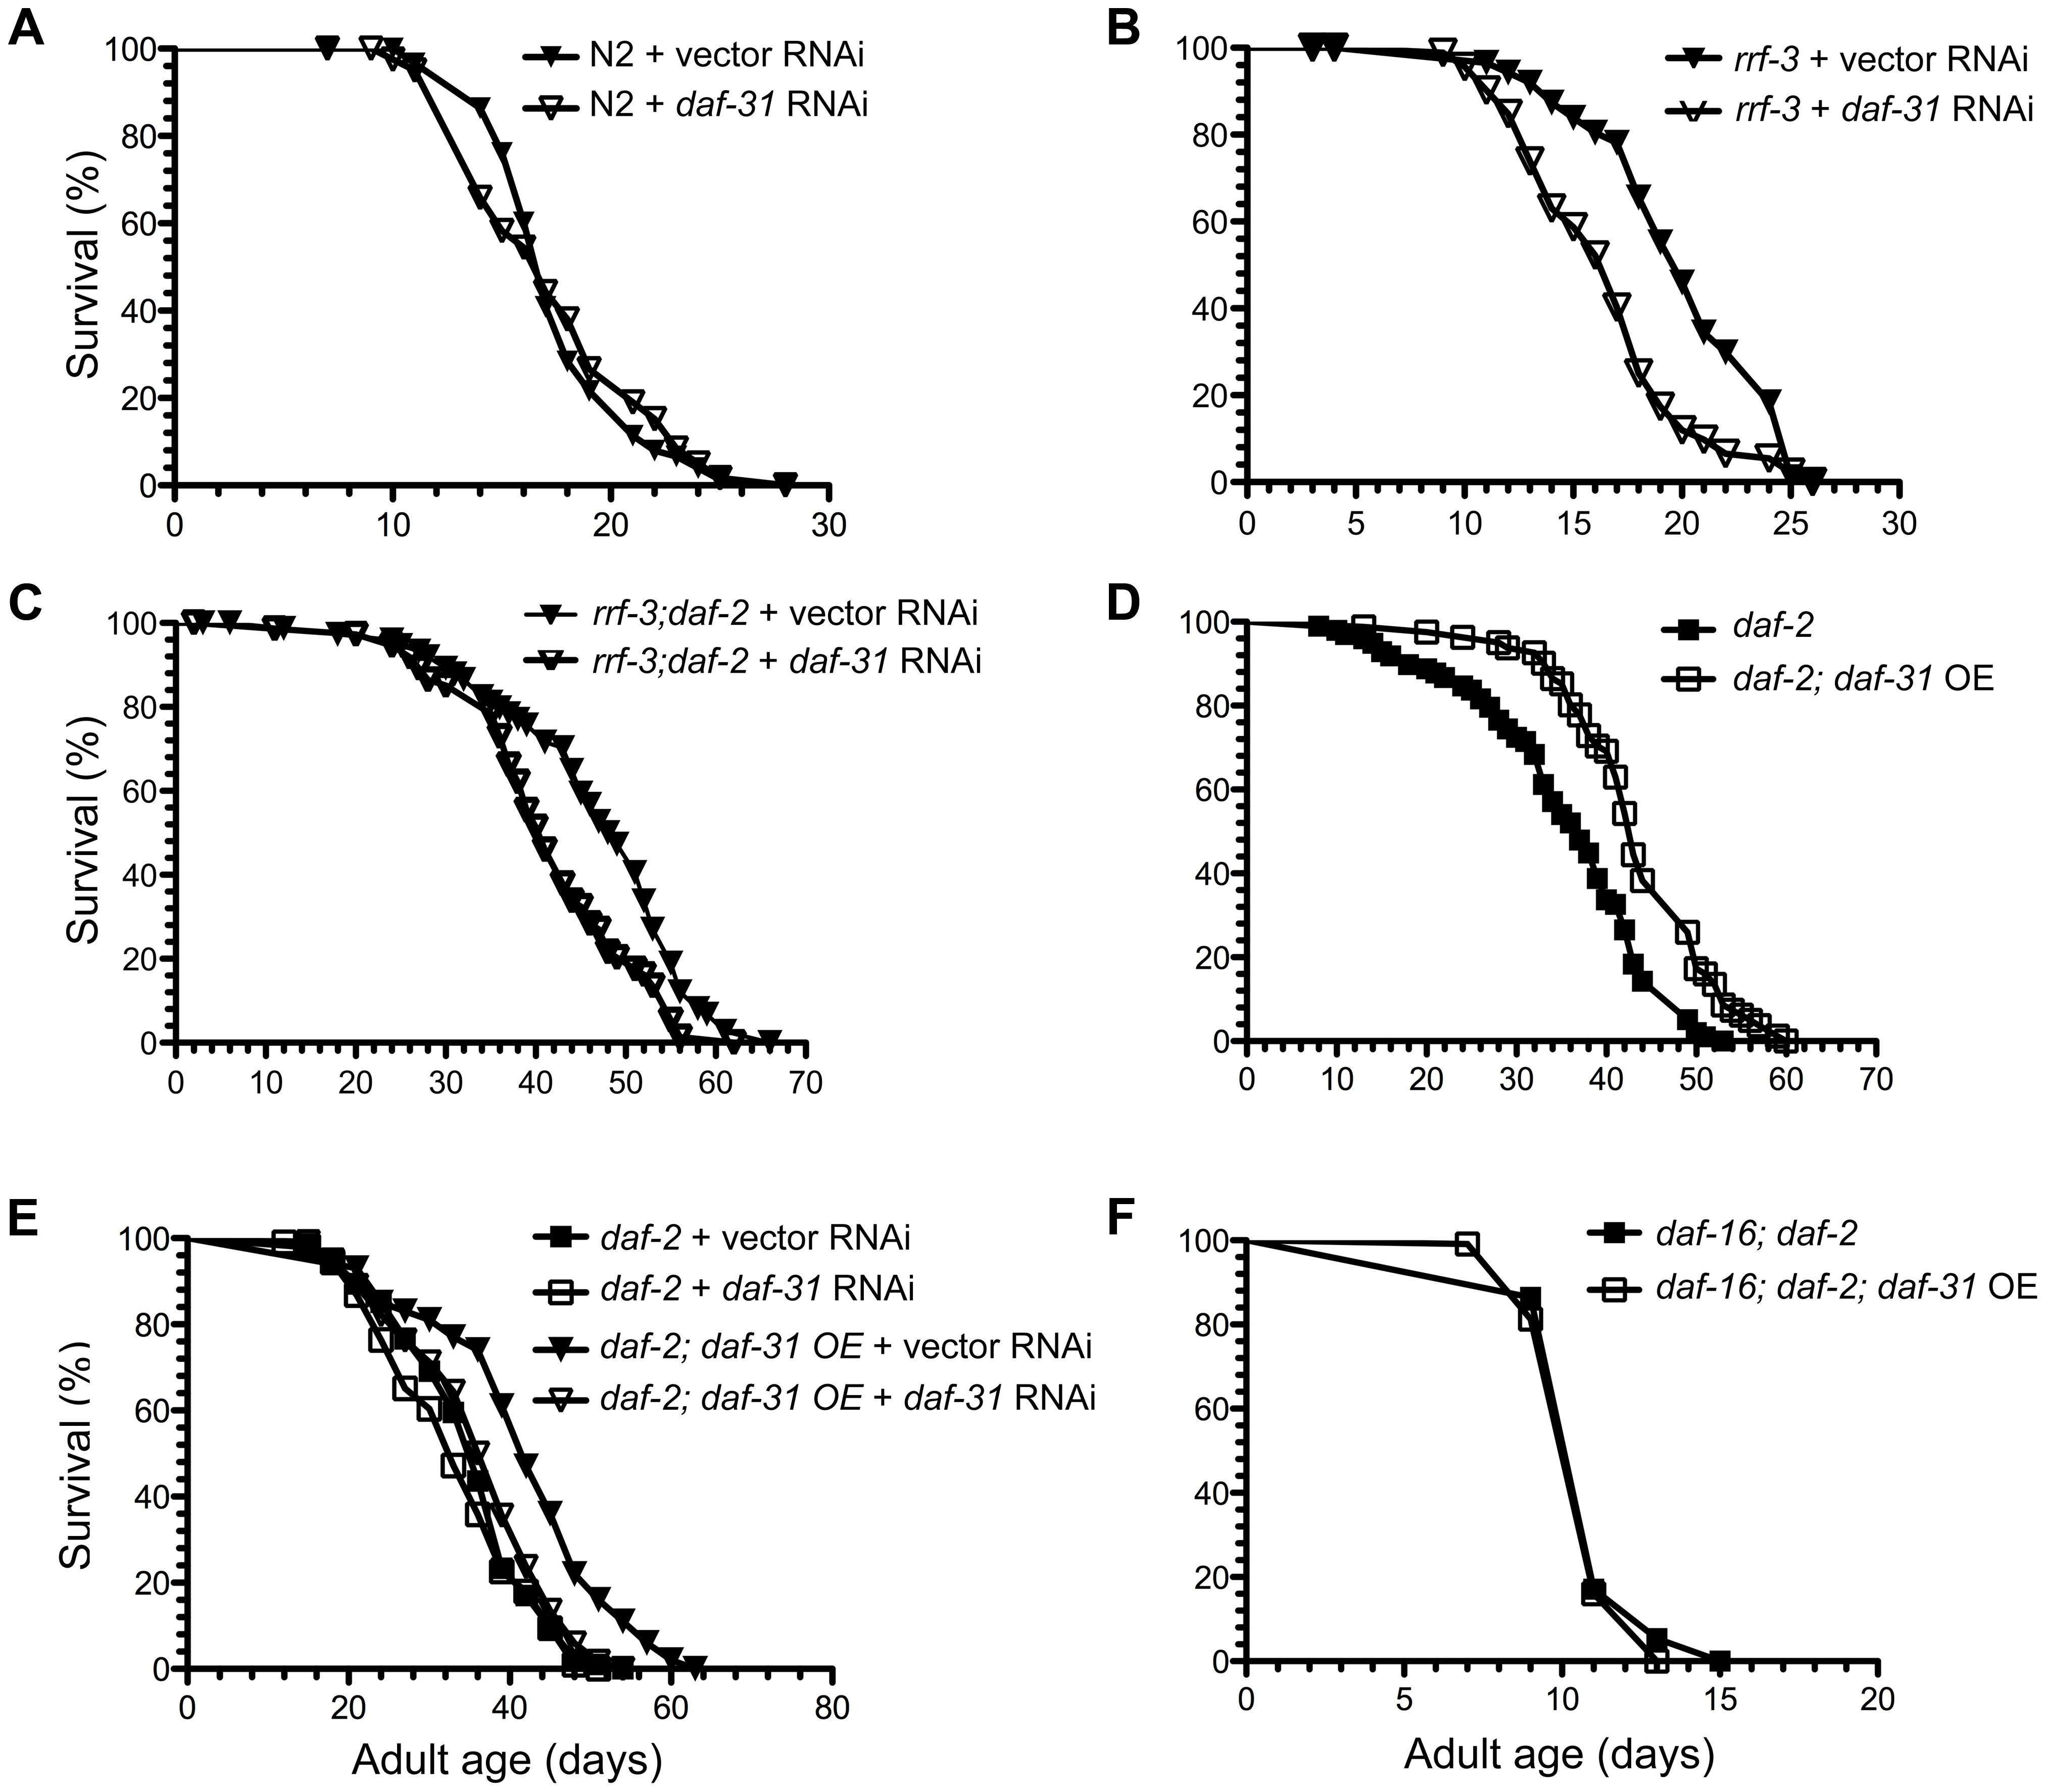 Influence of <i>daf-31</i> on <i>C. elegans</i> lifespan.